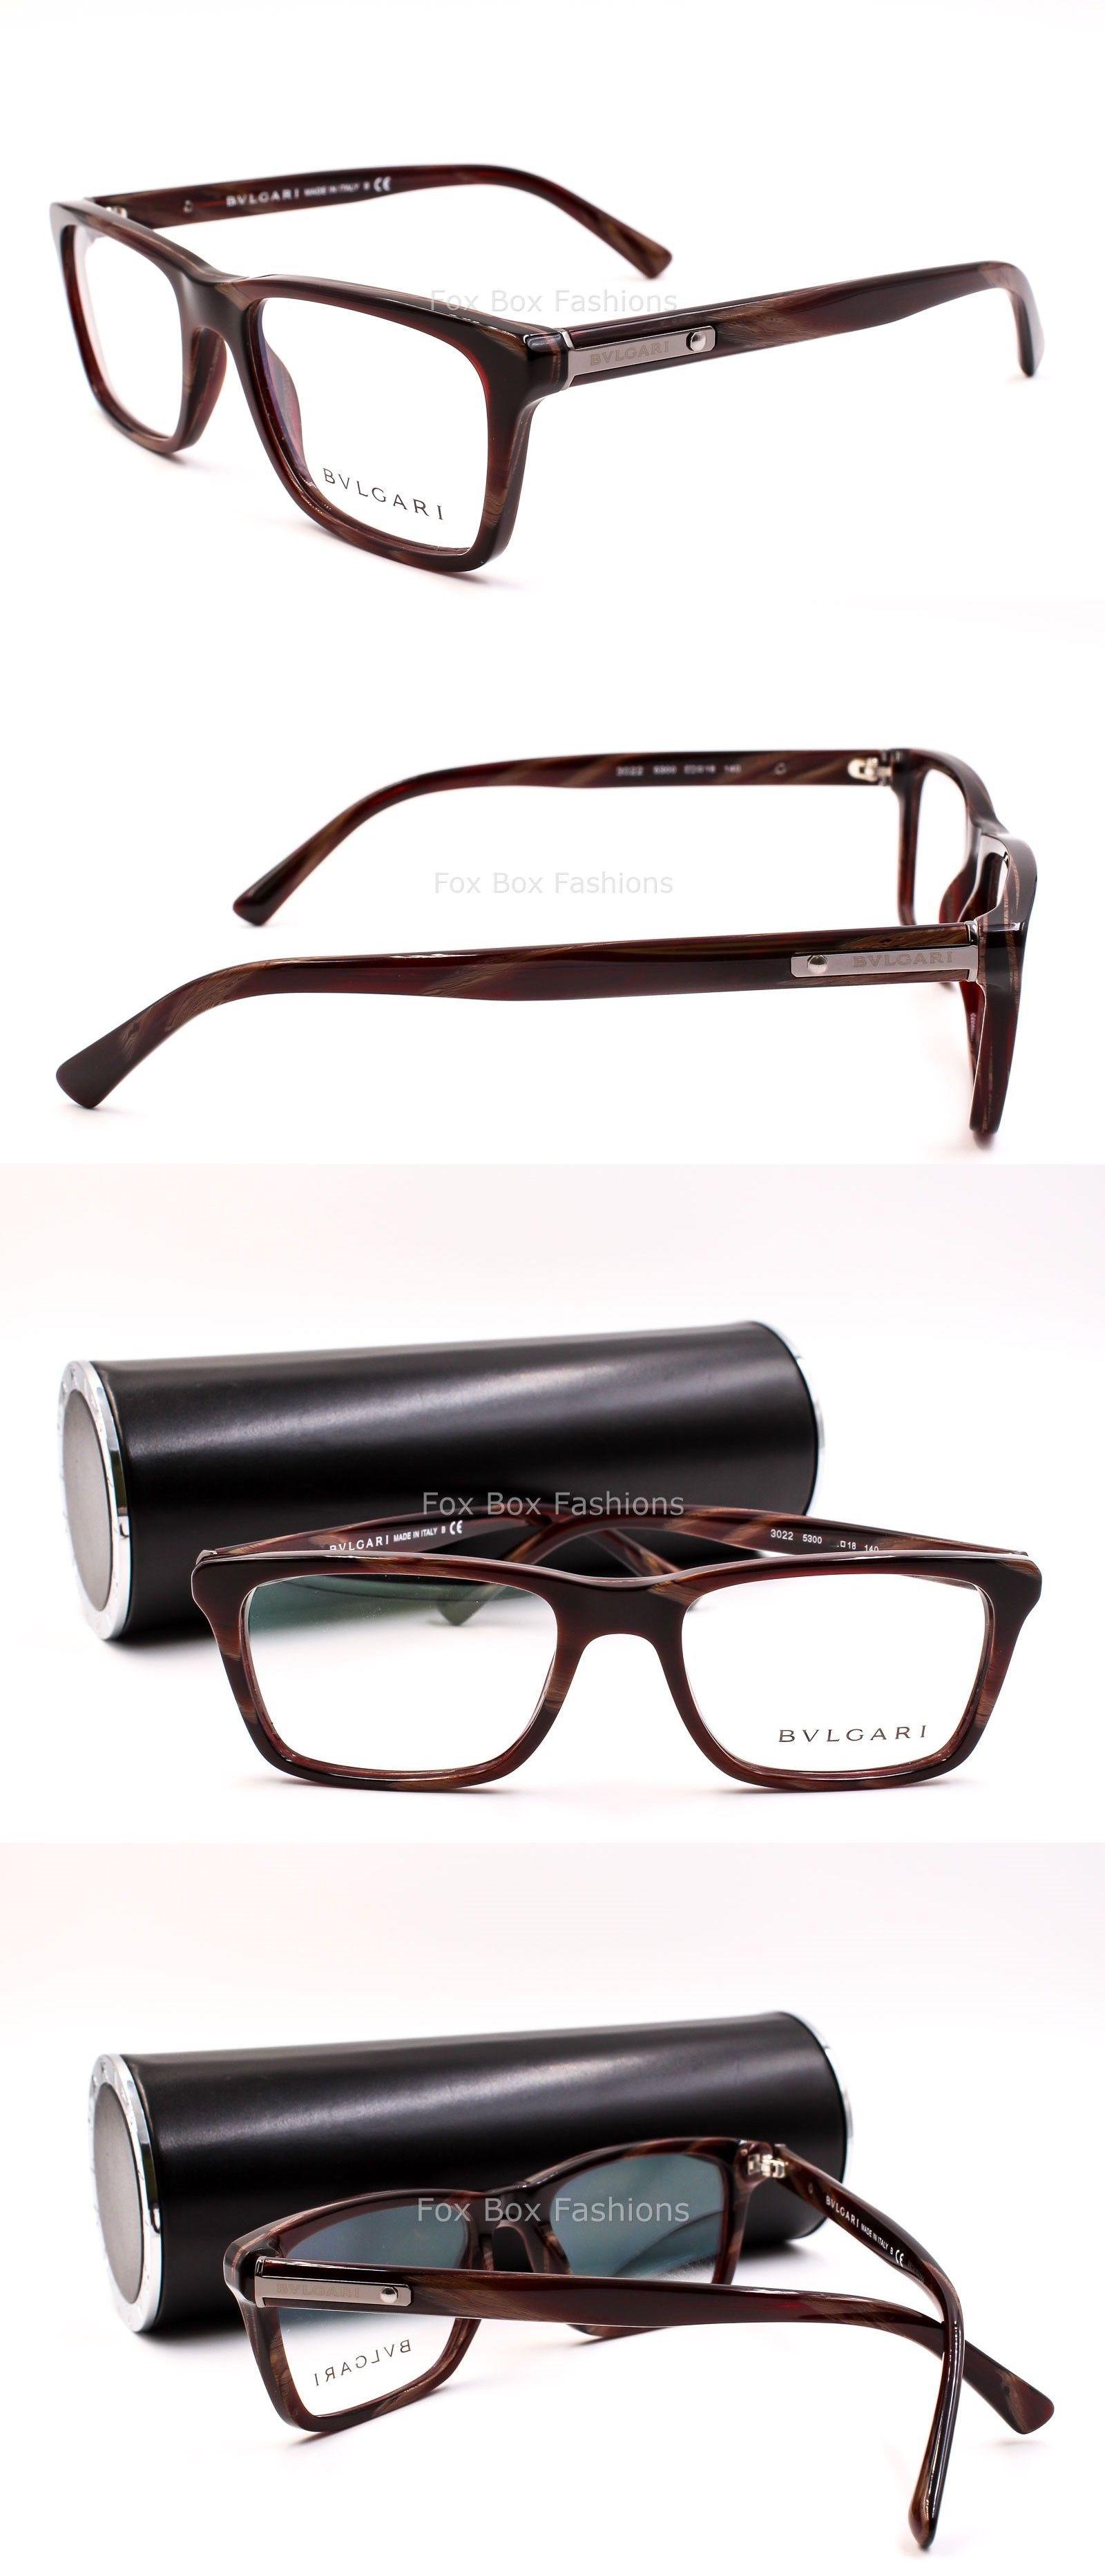 eyeglass frames bvlgari 3022 5300 men s eyeglasses optical frames glasses brown red horn - Ebay Eyeglasses Frames